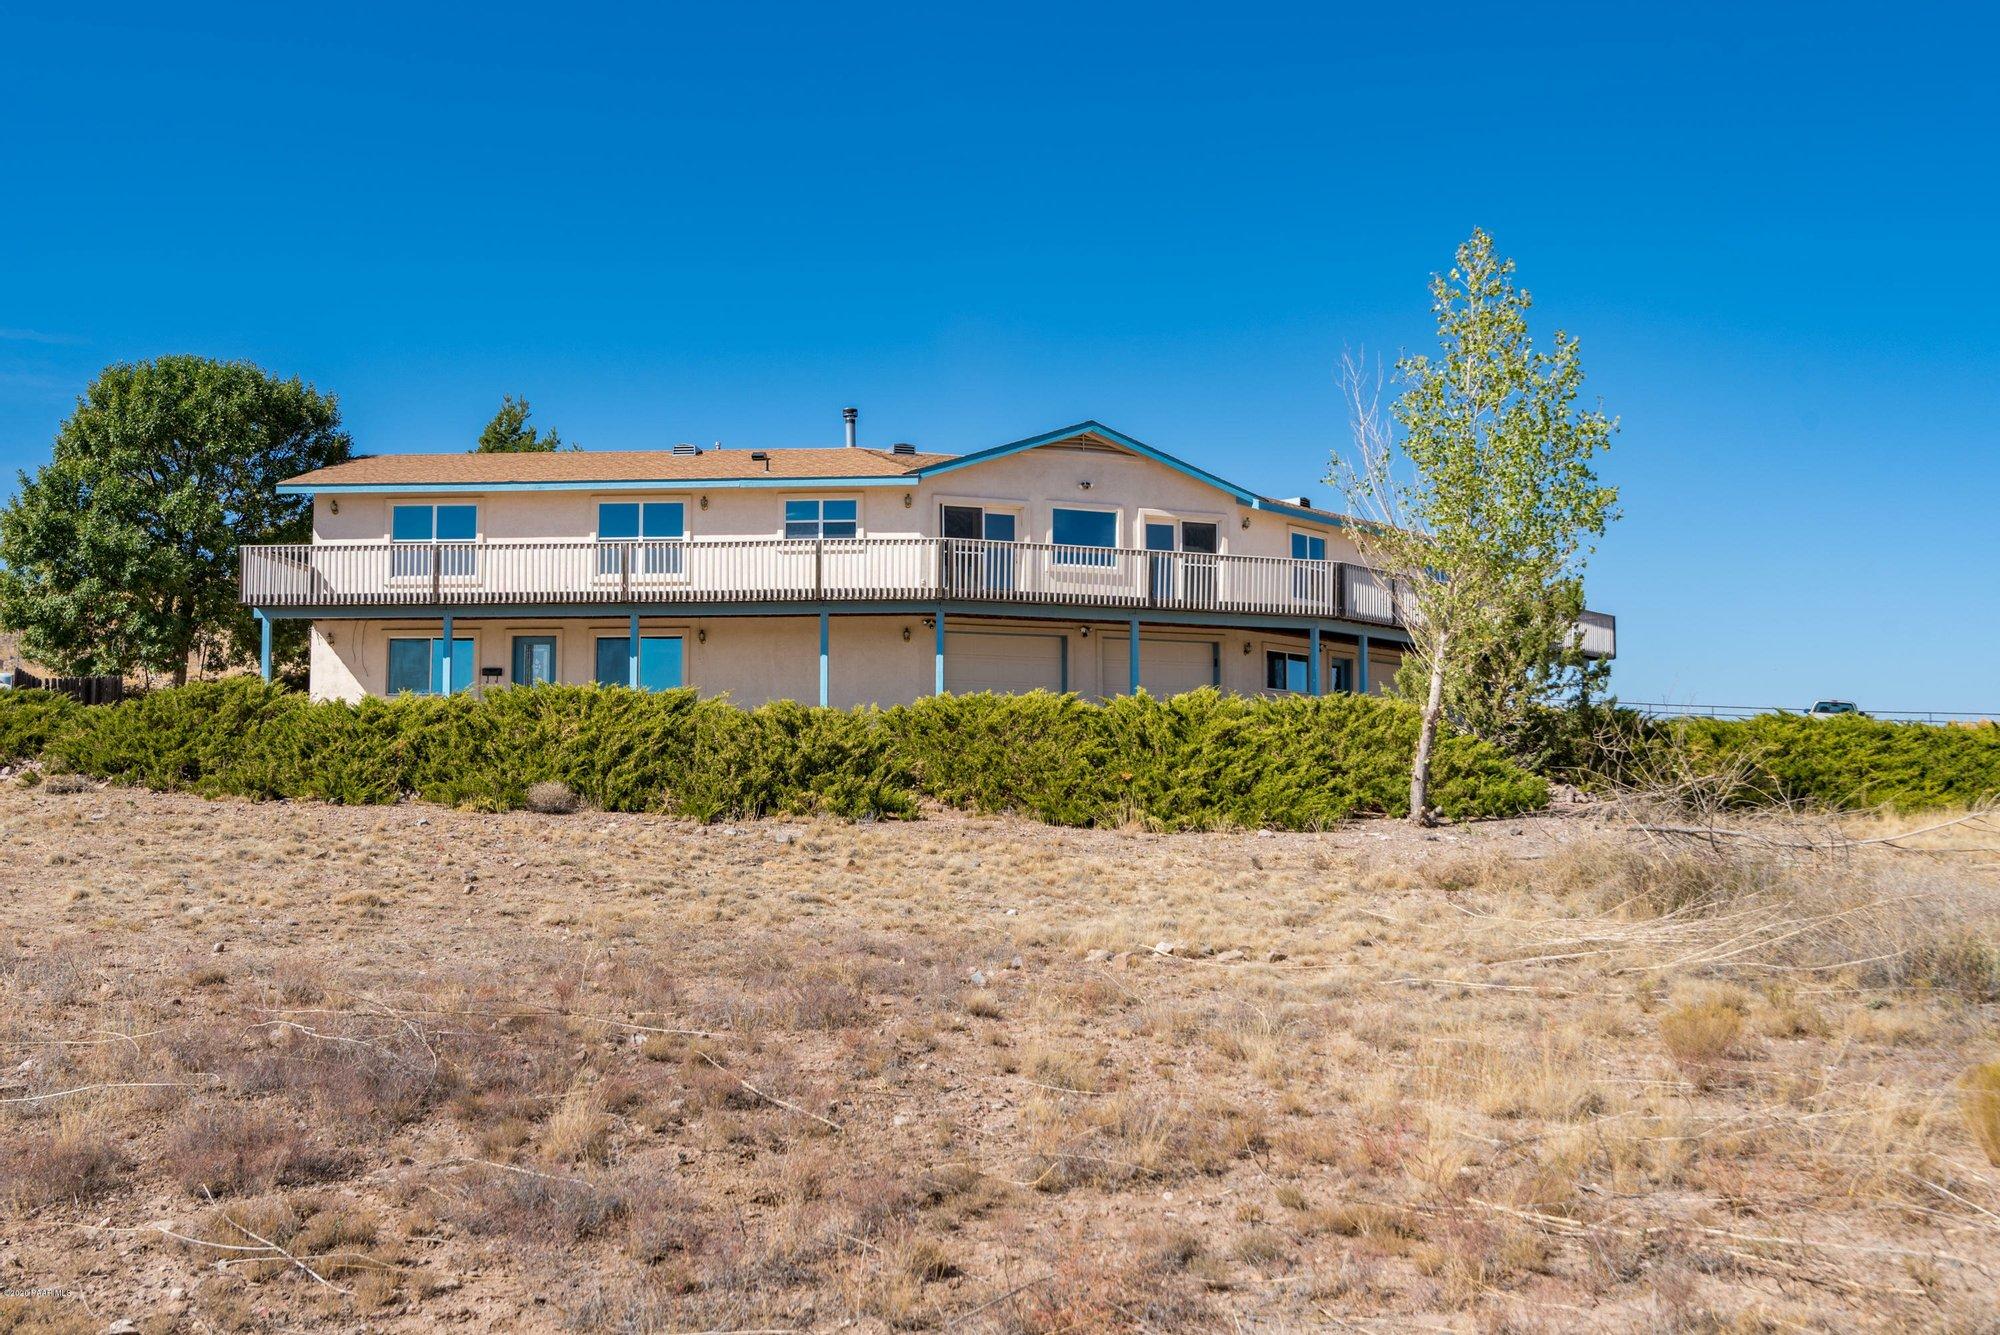 House in Paulden, Arizona, United States 1